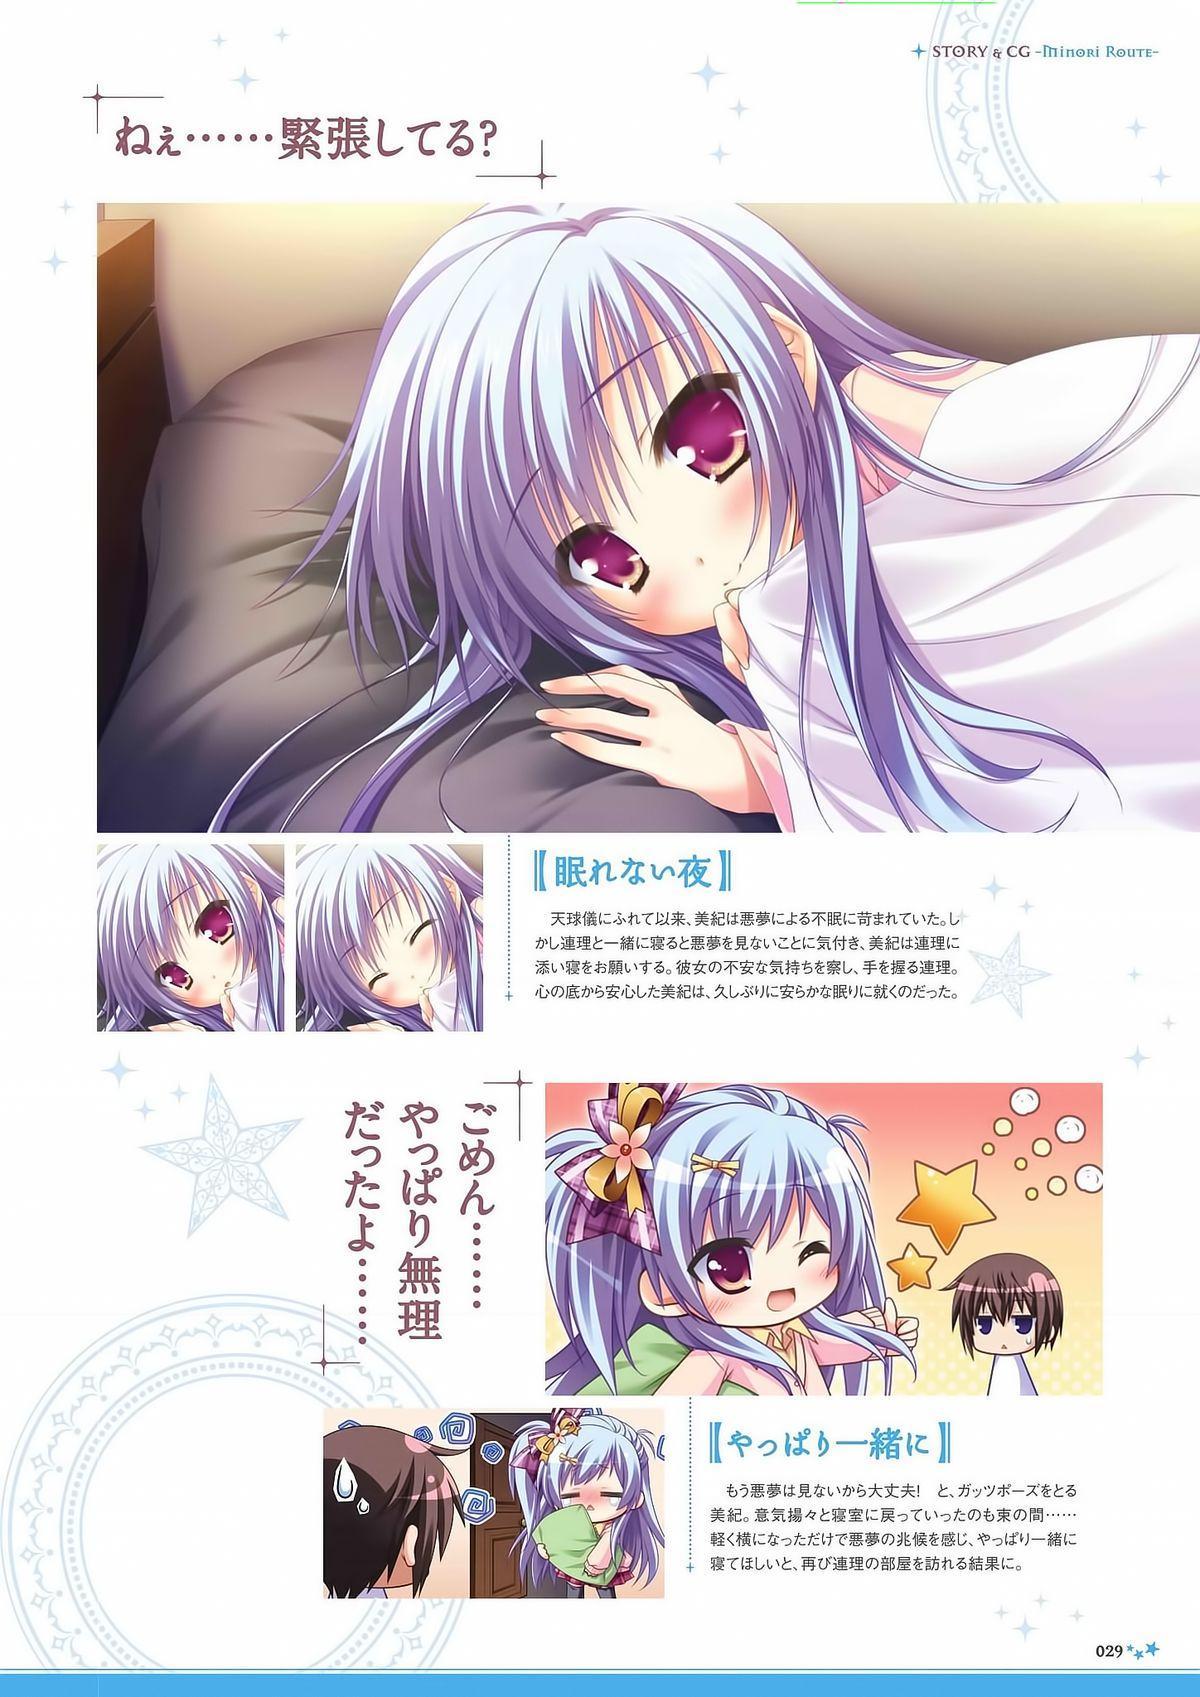 Sekai to Sekai no Mannaka de Visual Fanbook 30